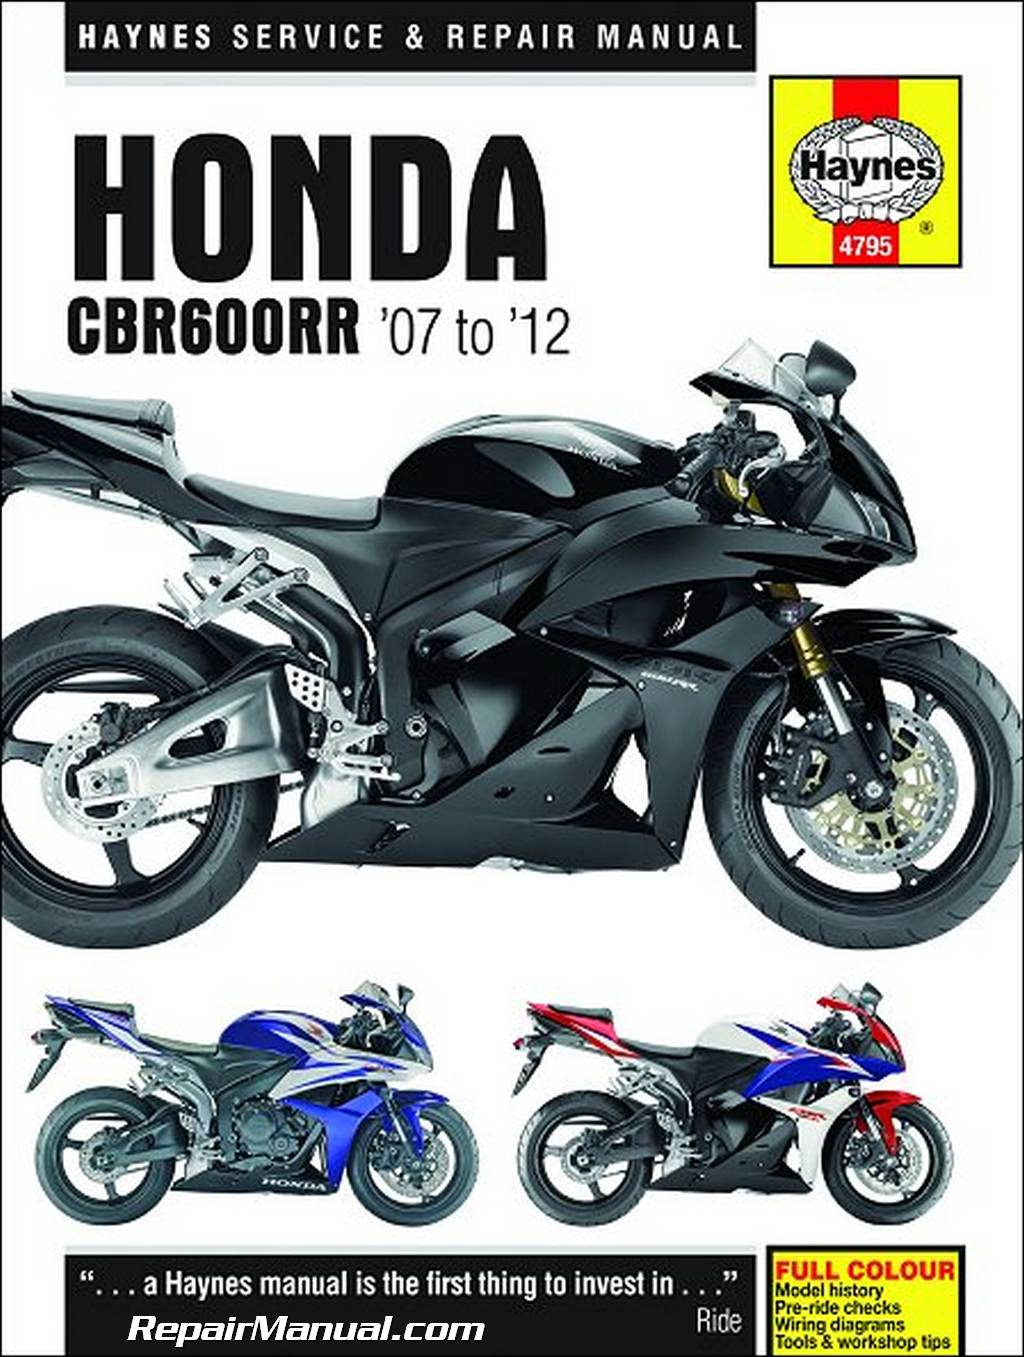 honda cbr600rr haynes motorcycle repair manual 2007 2012. Black Bedroom Furniture Sets. Home Design Ideas